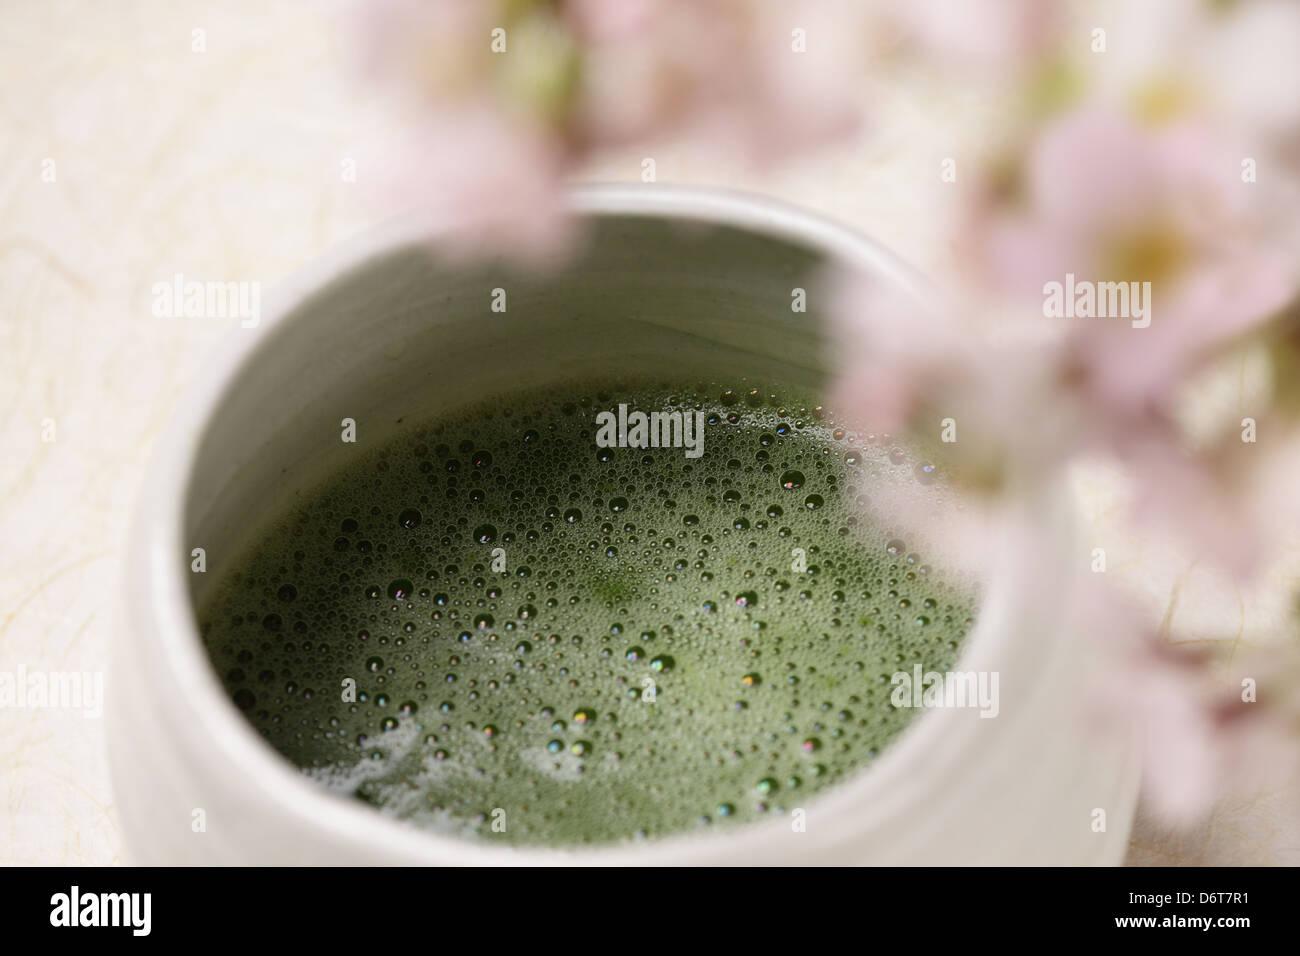 Thé vert matcha Photo Stock